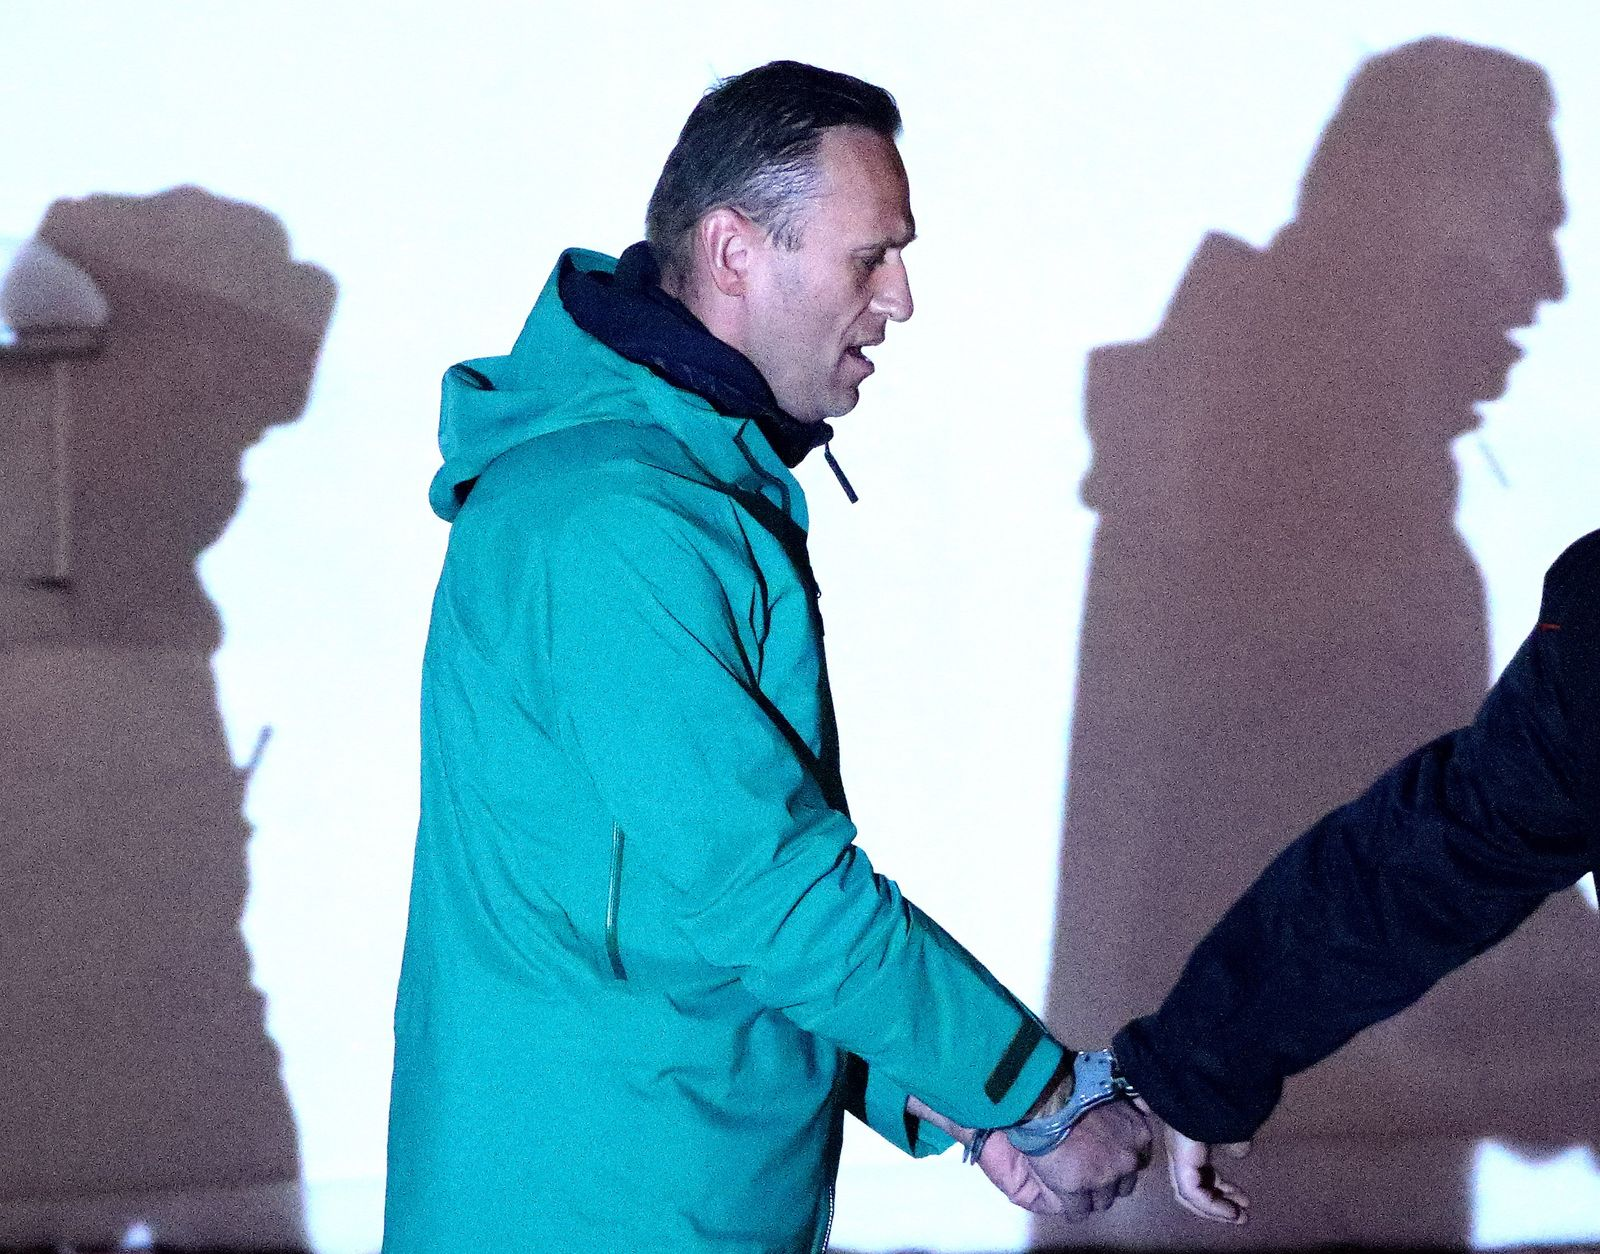 Kremlkritiker Nawalny in Russland